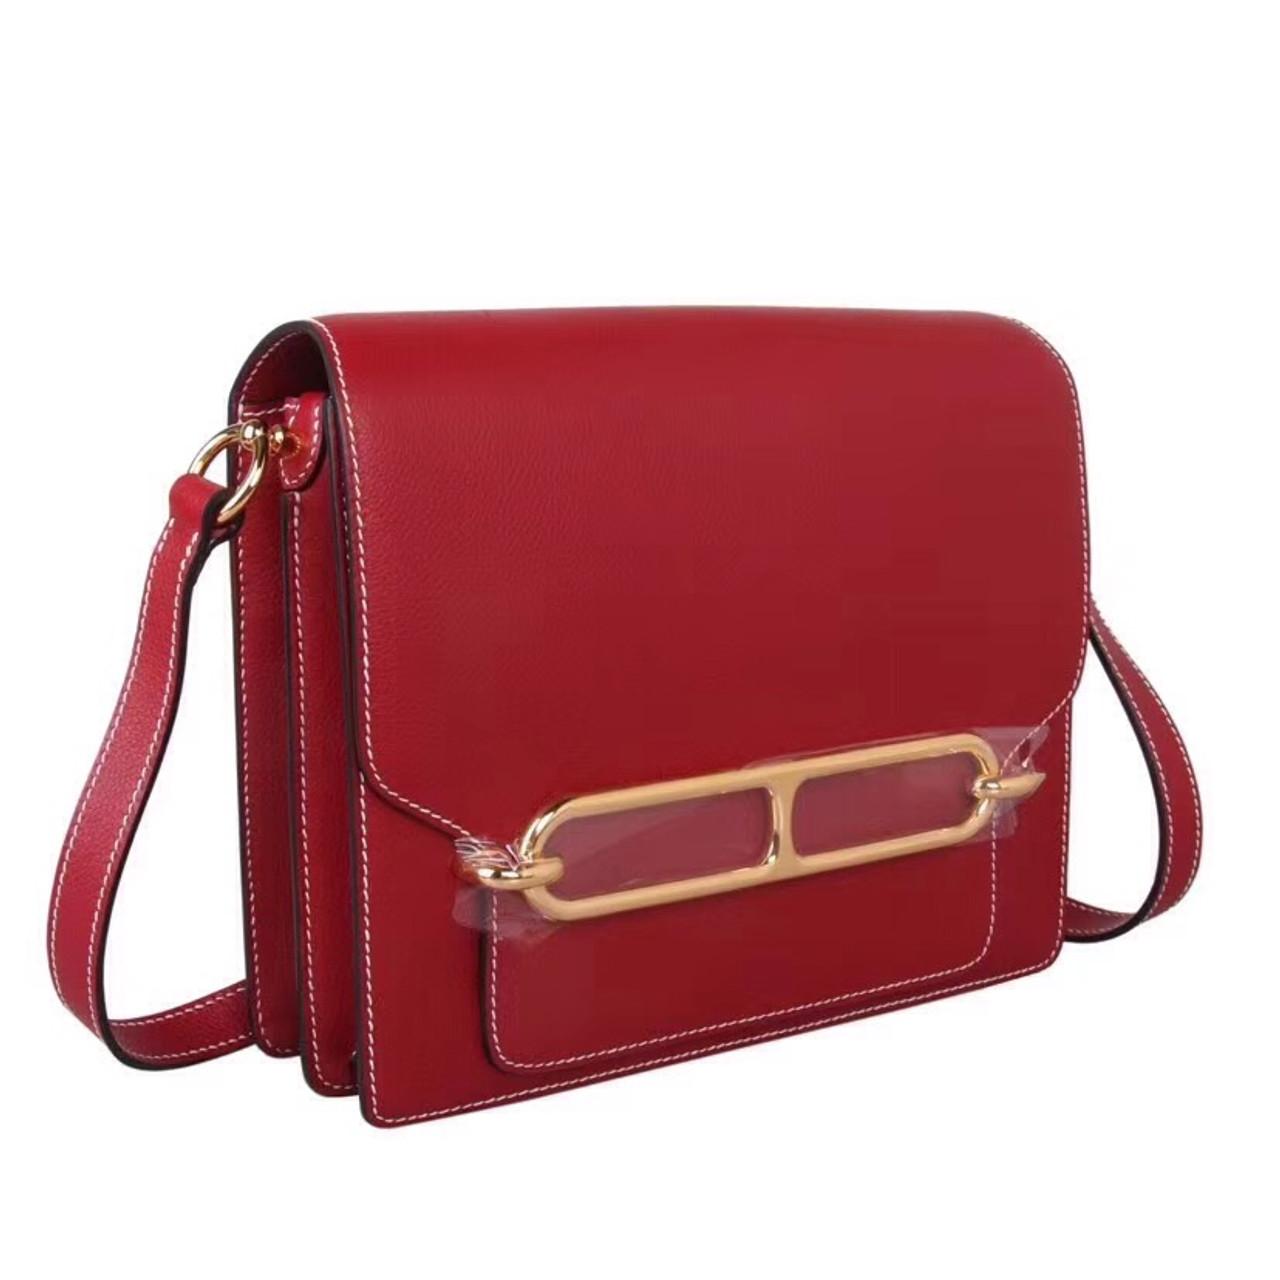 830bf9df9c Hermes 23 Rouge Garance Sac Roulis Bag - Bella Vita Moda